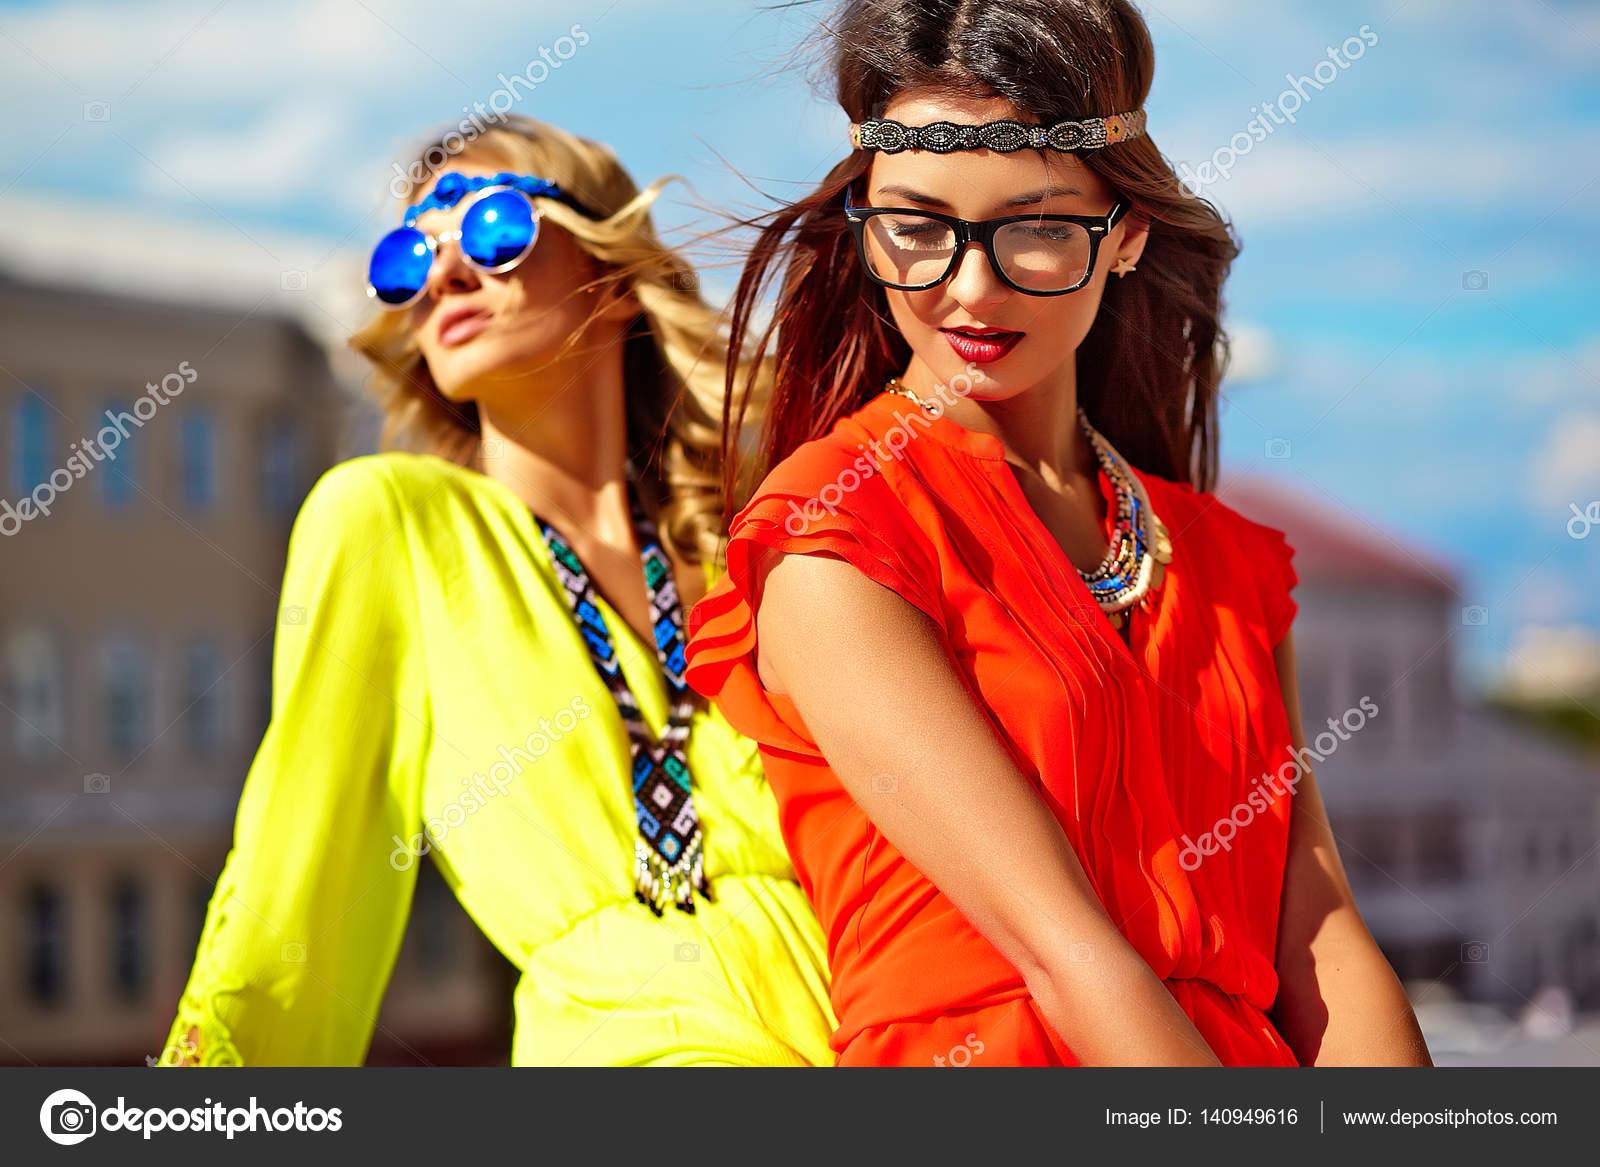 d8e2a58b53 Dos modelos de mujer joven hippie en día soleado de verano en ropa hipster  colorido brillante